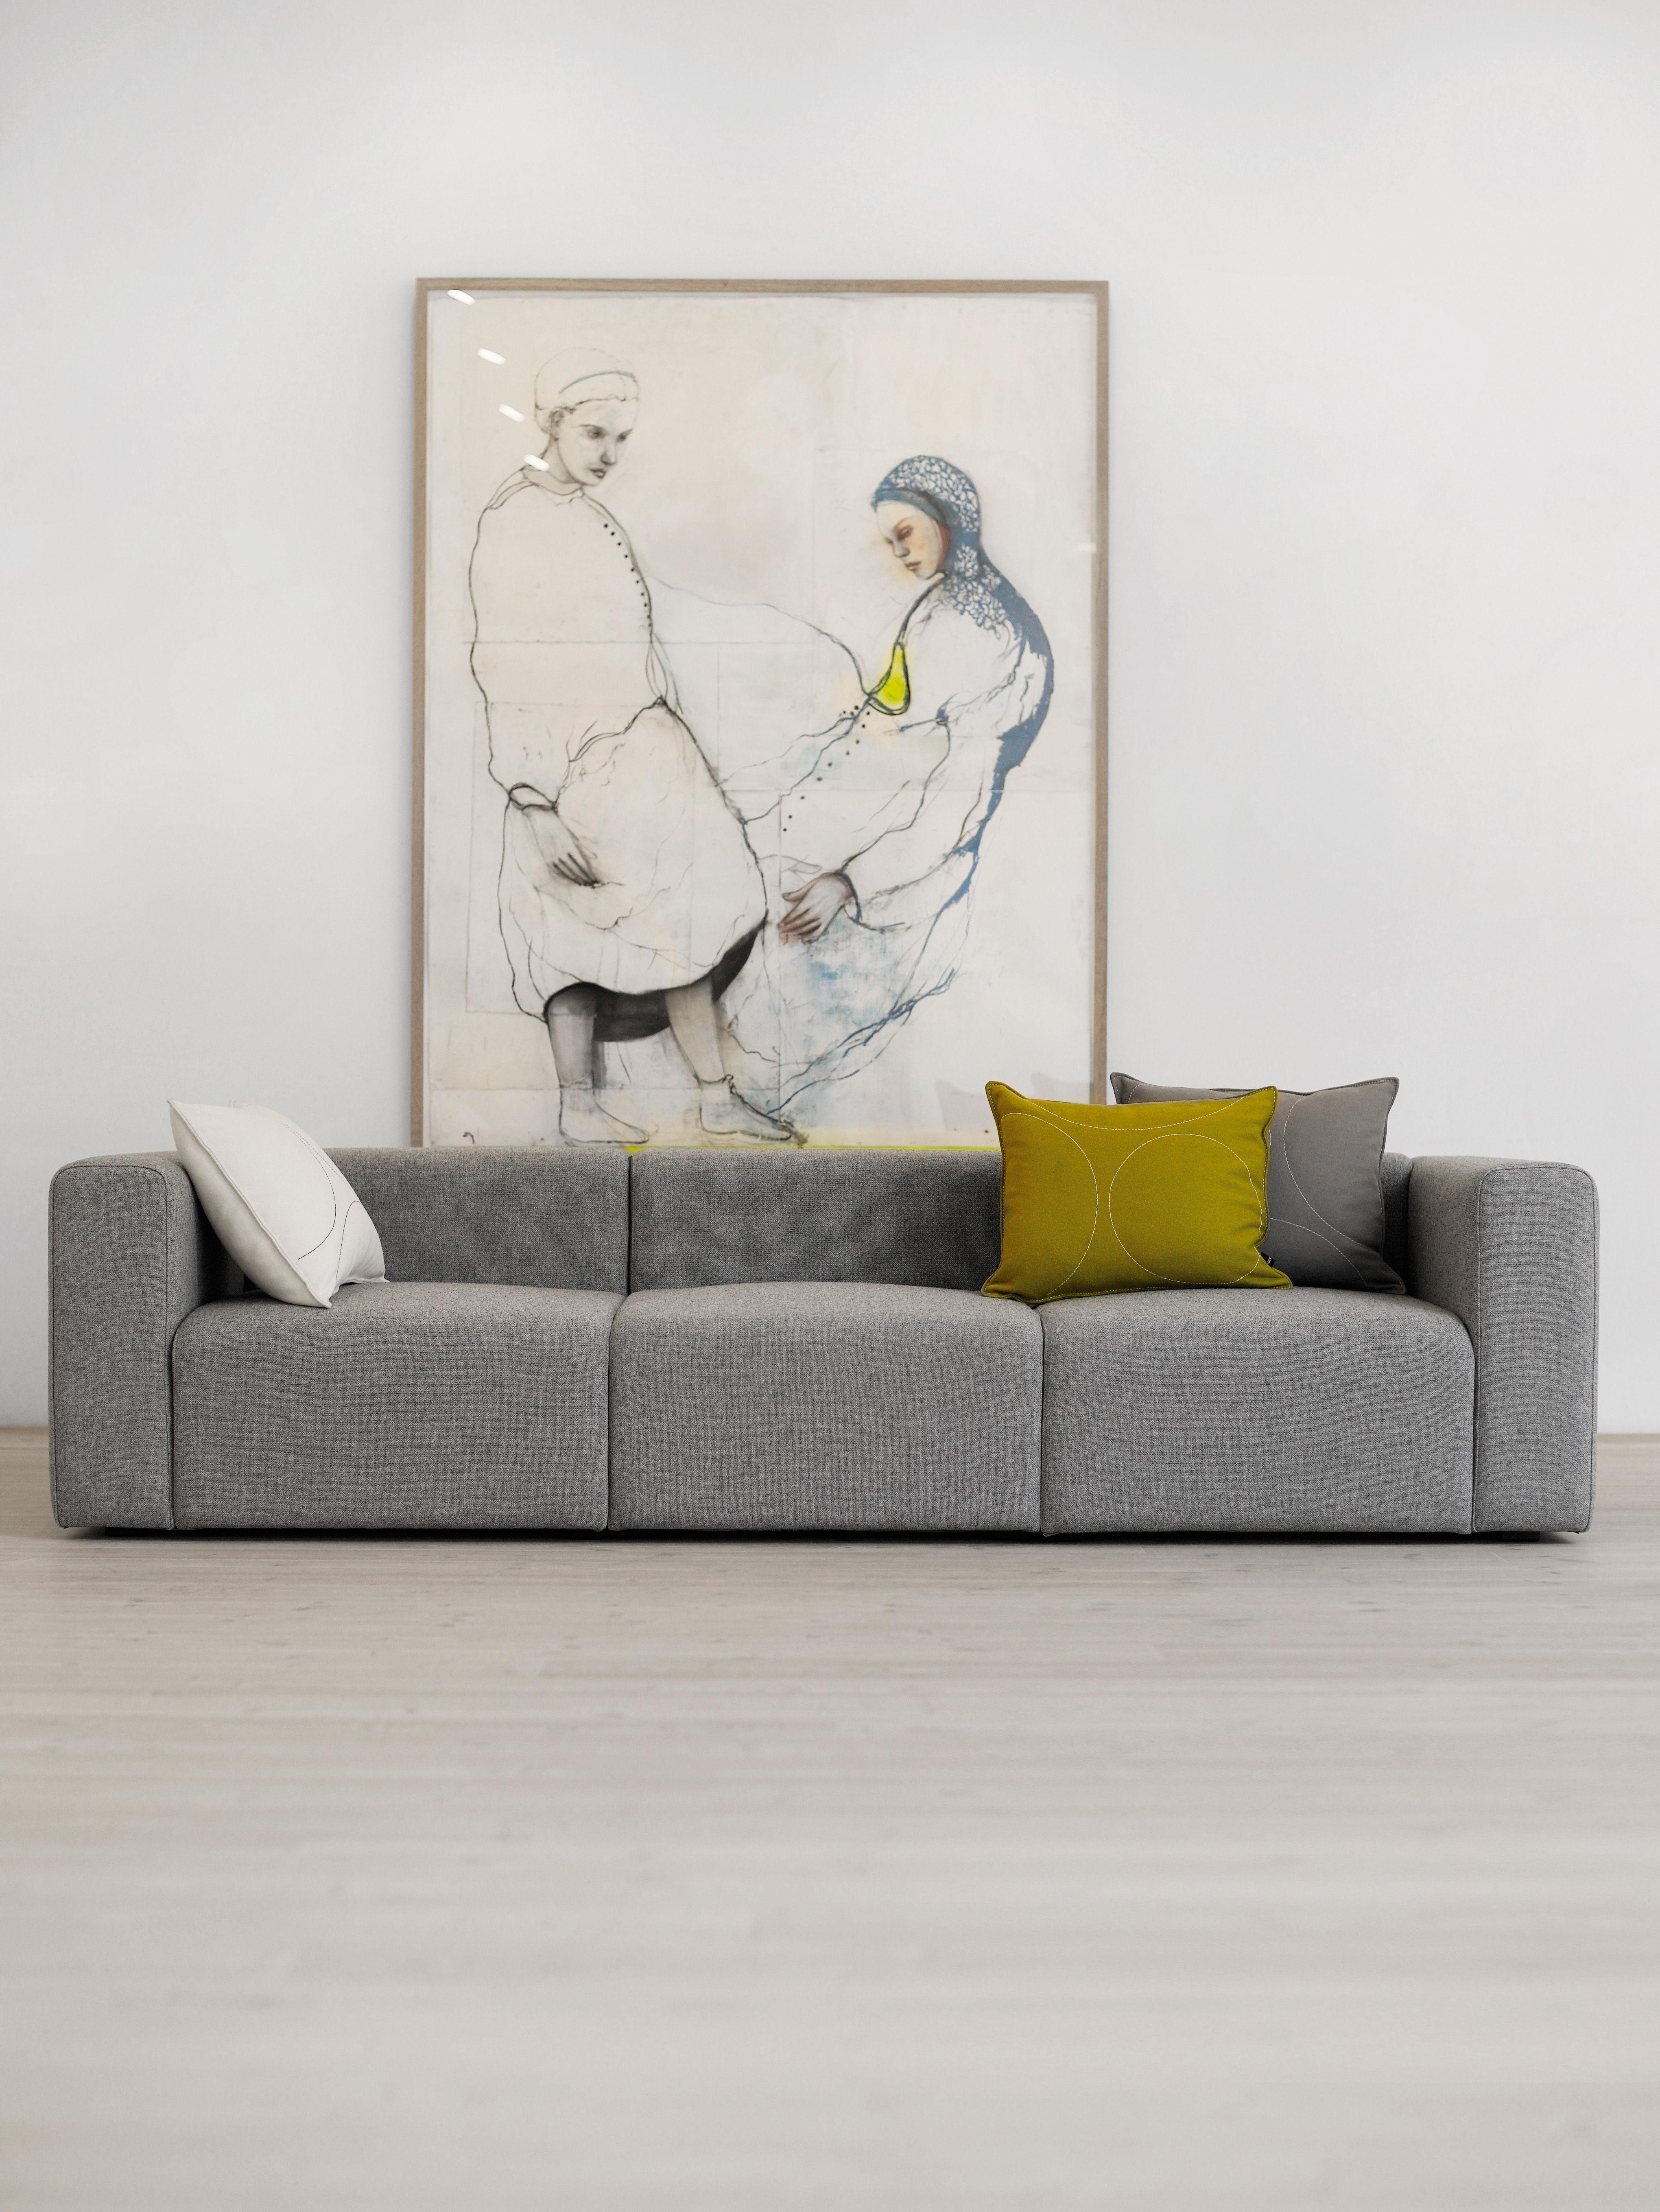 mags straight sofa 3 seats l 266 cm hallingdal fabric light grey by hay. Black Bedroom Furniture Sets. Home Design Ideas